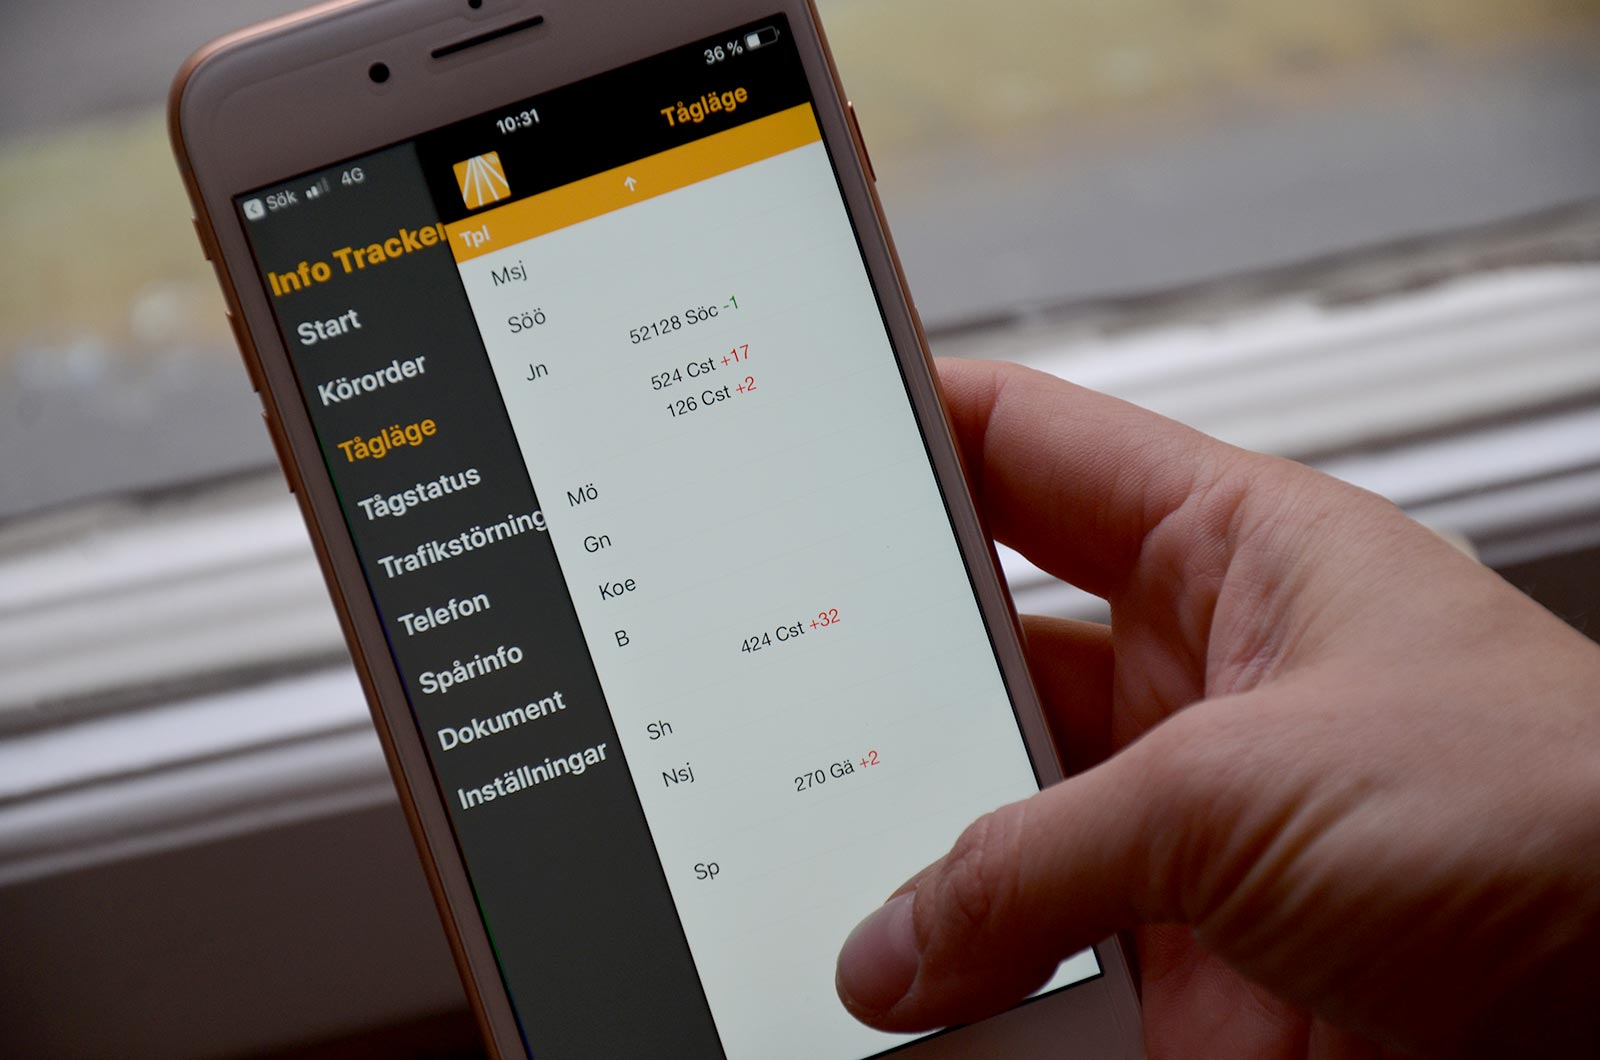 Info Tracker - tågläge mobiltelefon